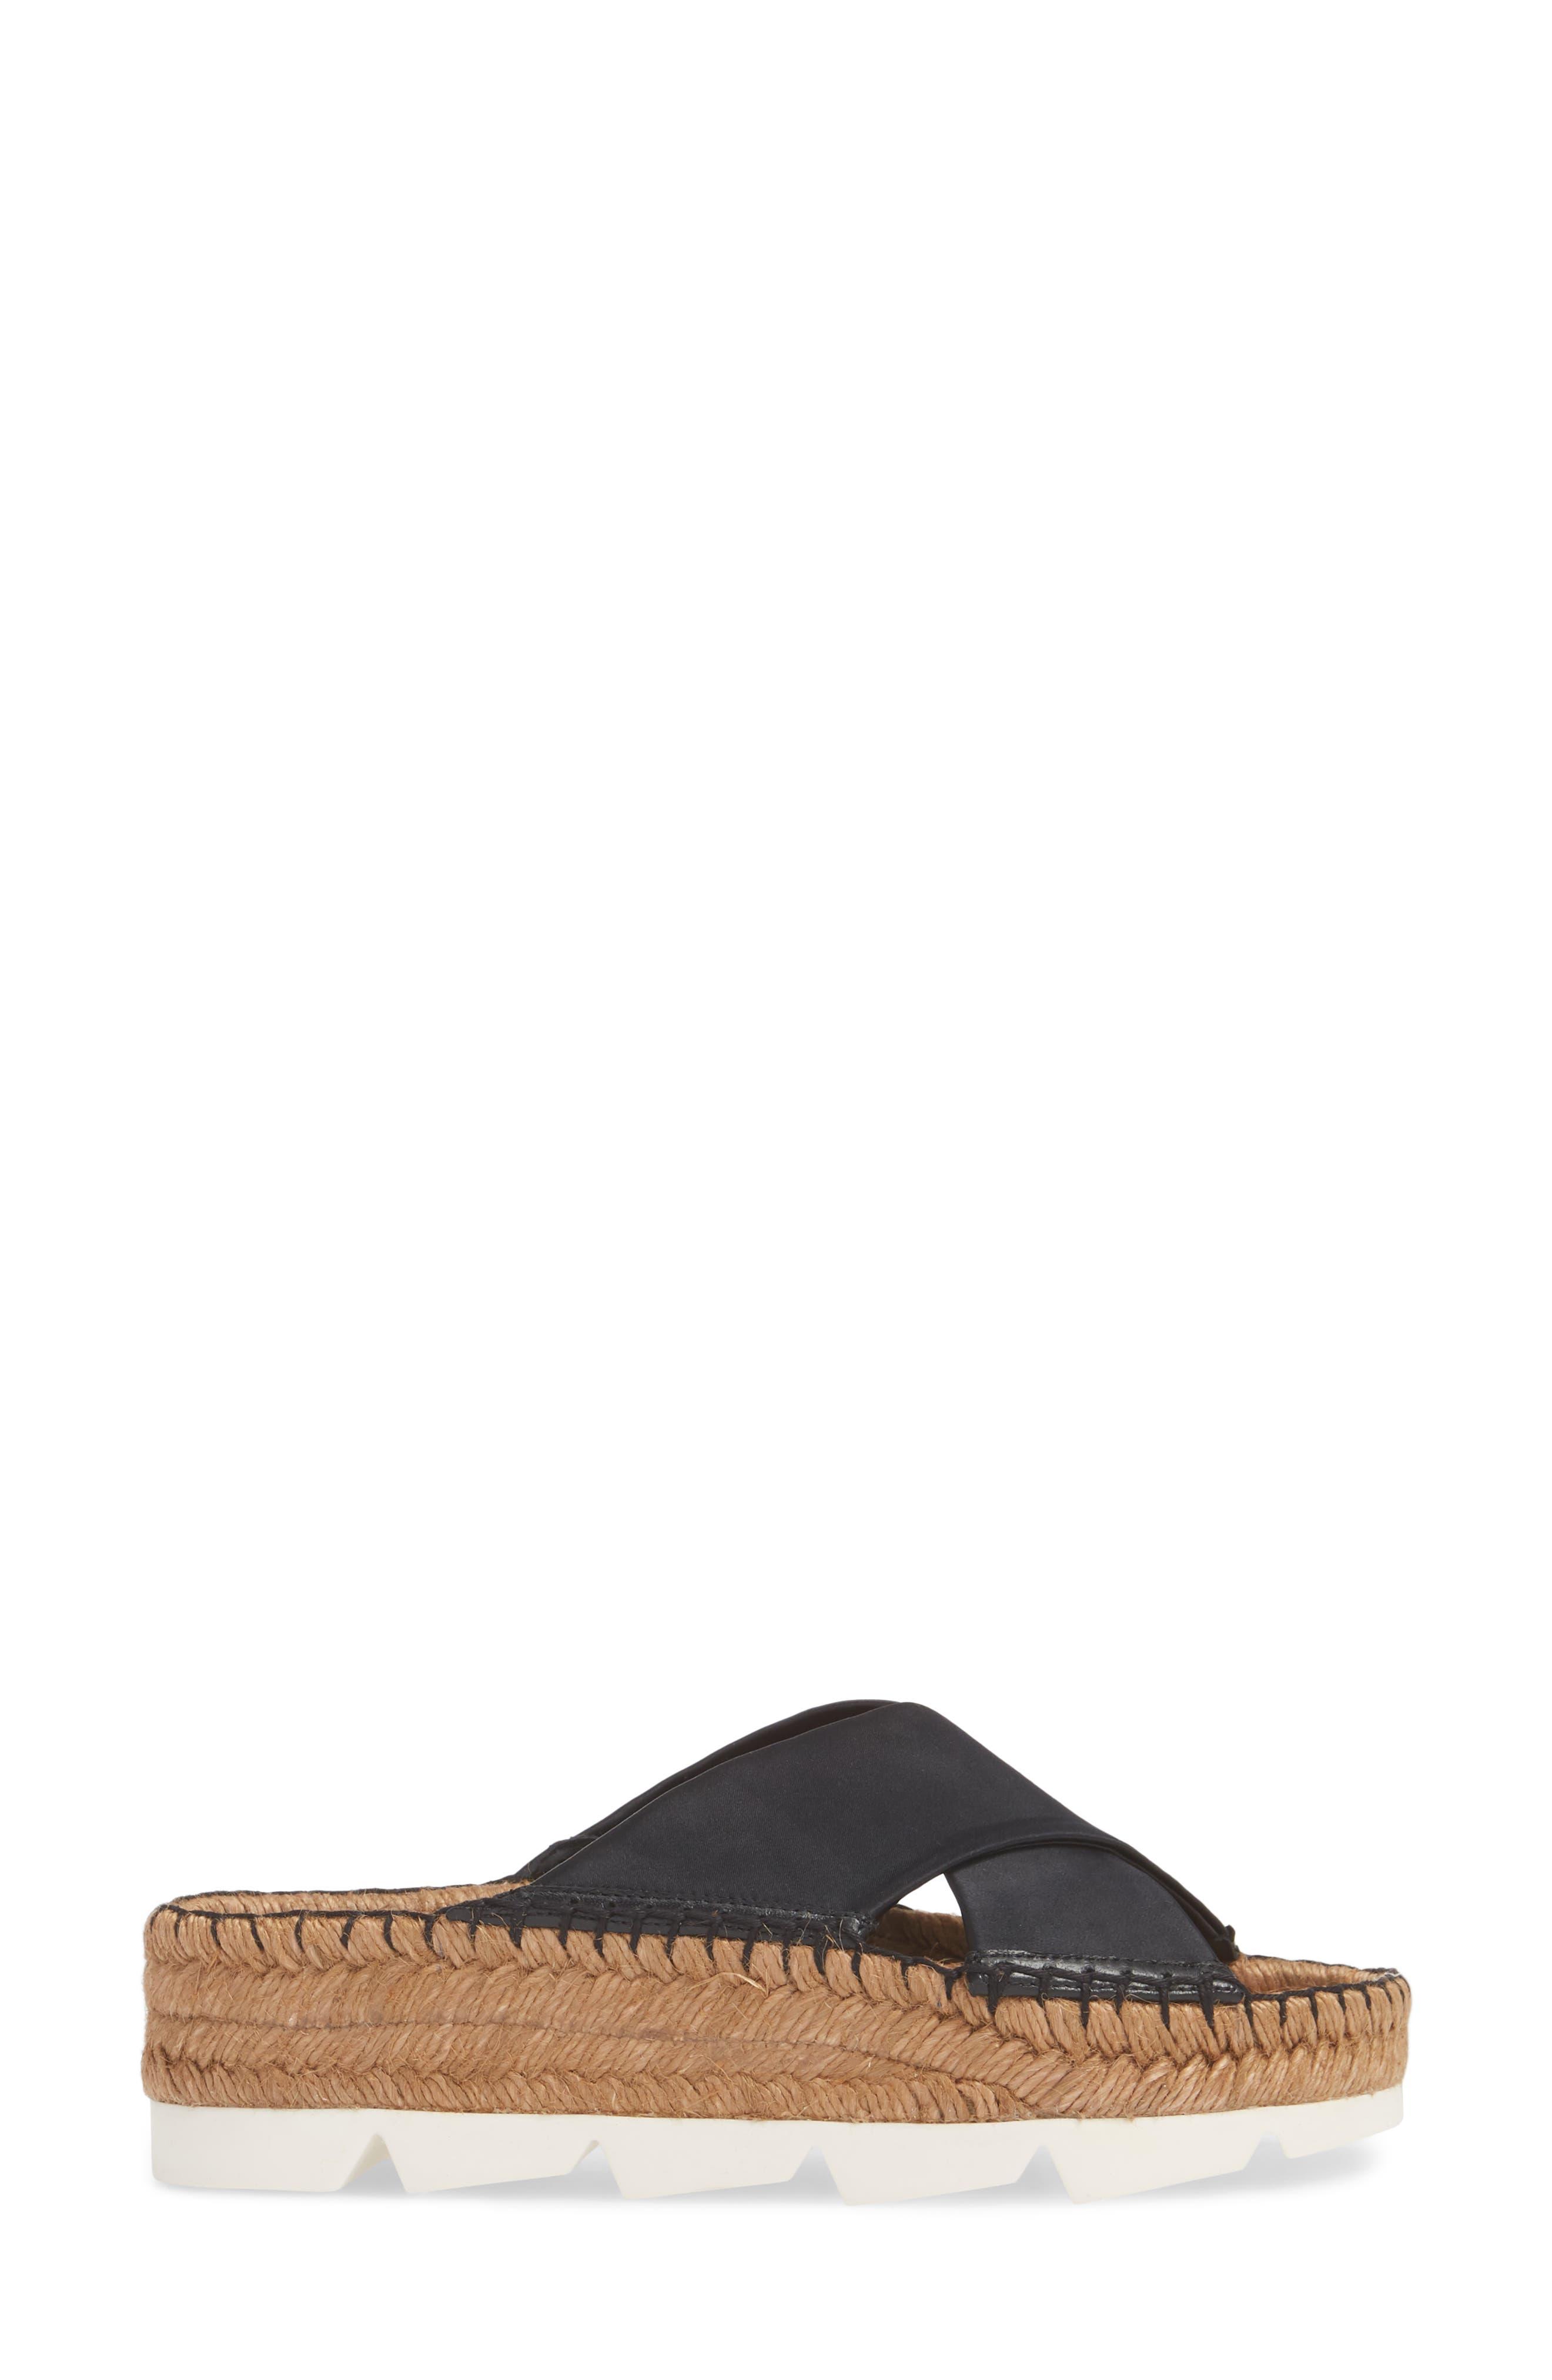 Danae Double Strap Espadrille Slide Sandal,                             Alternate thumbnail 3, color,                             Black